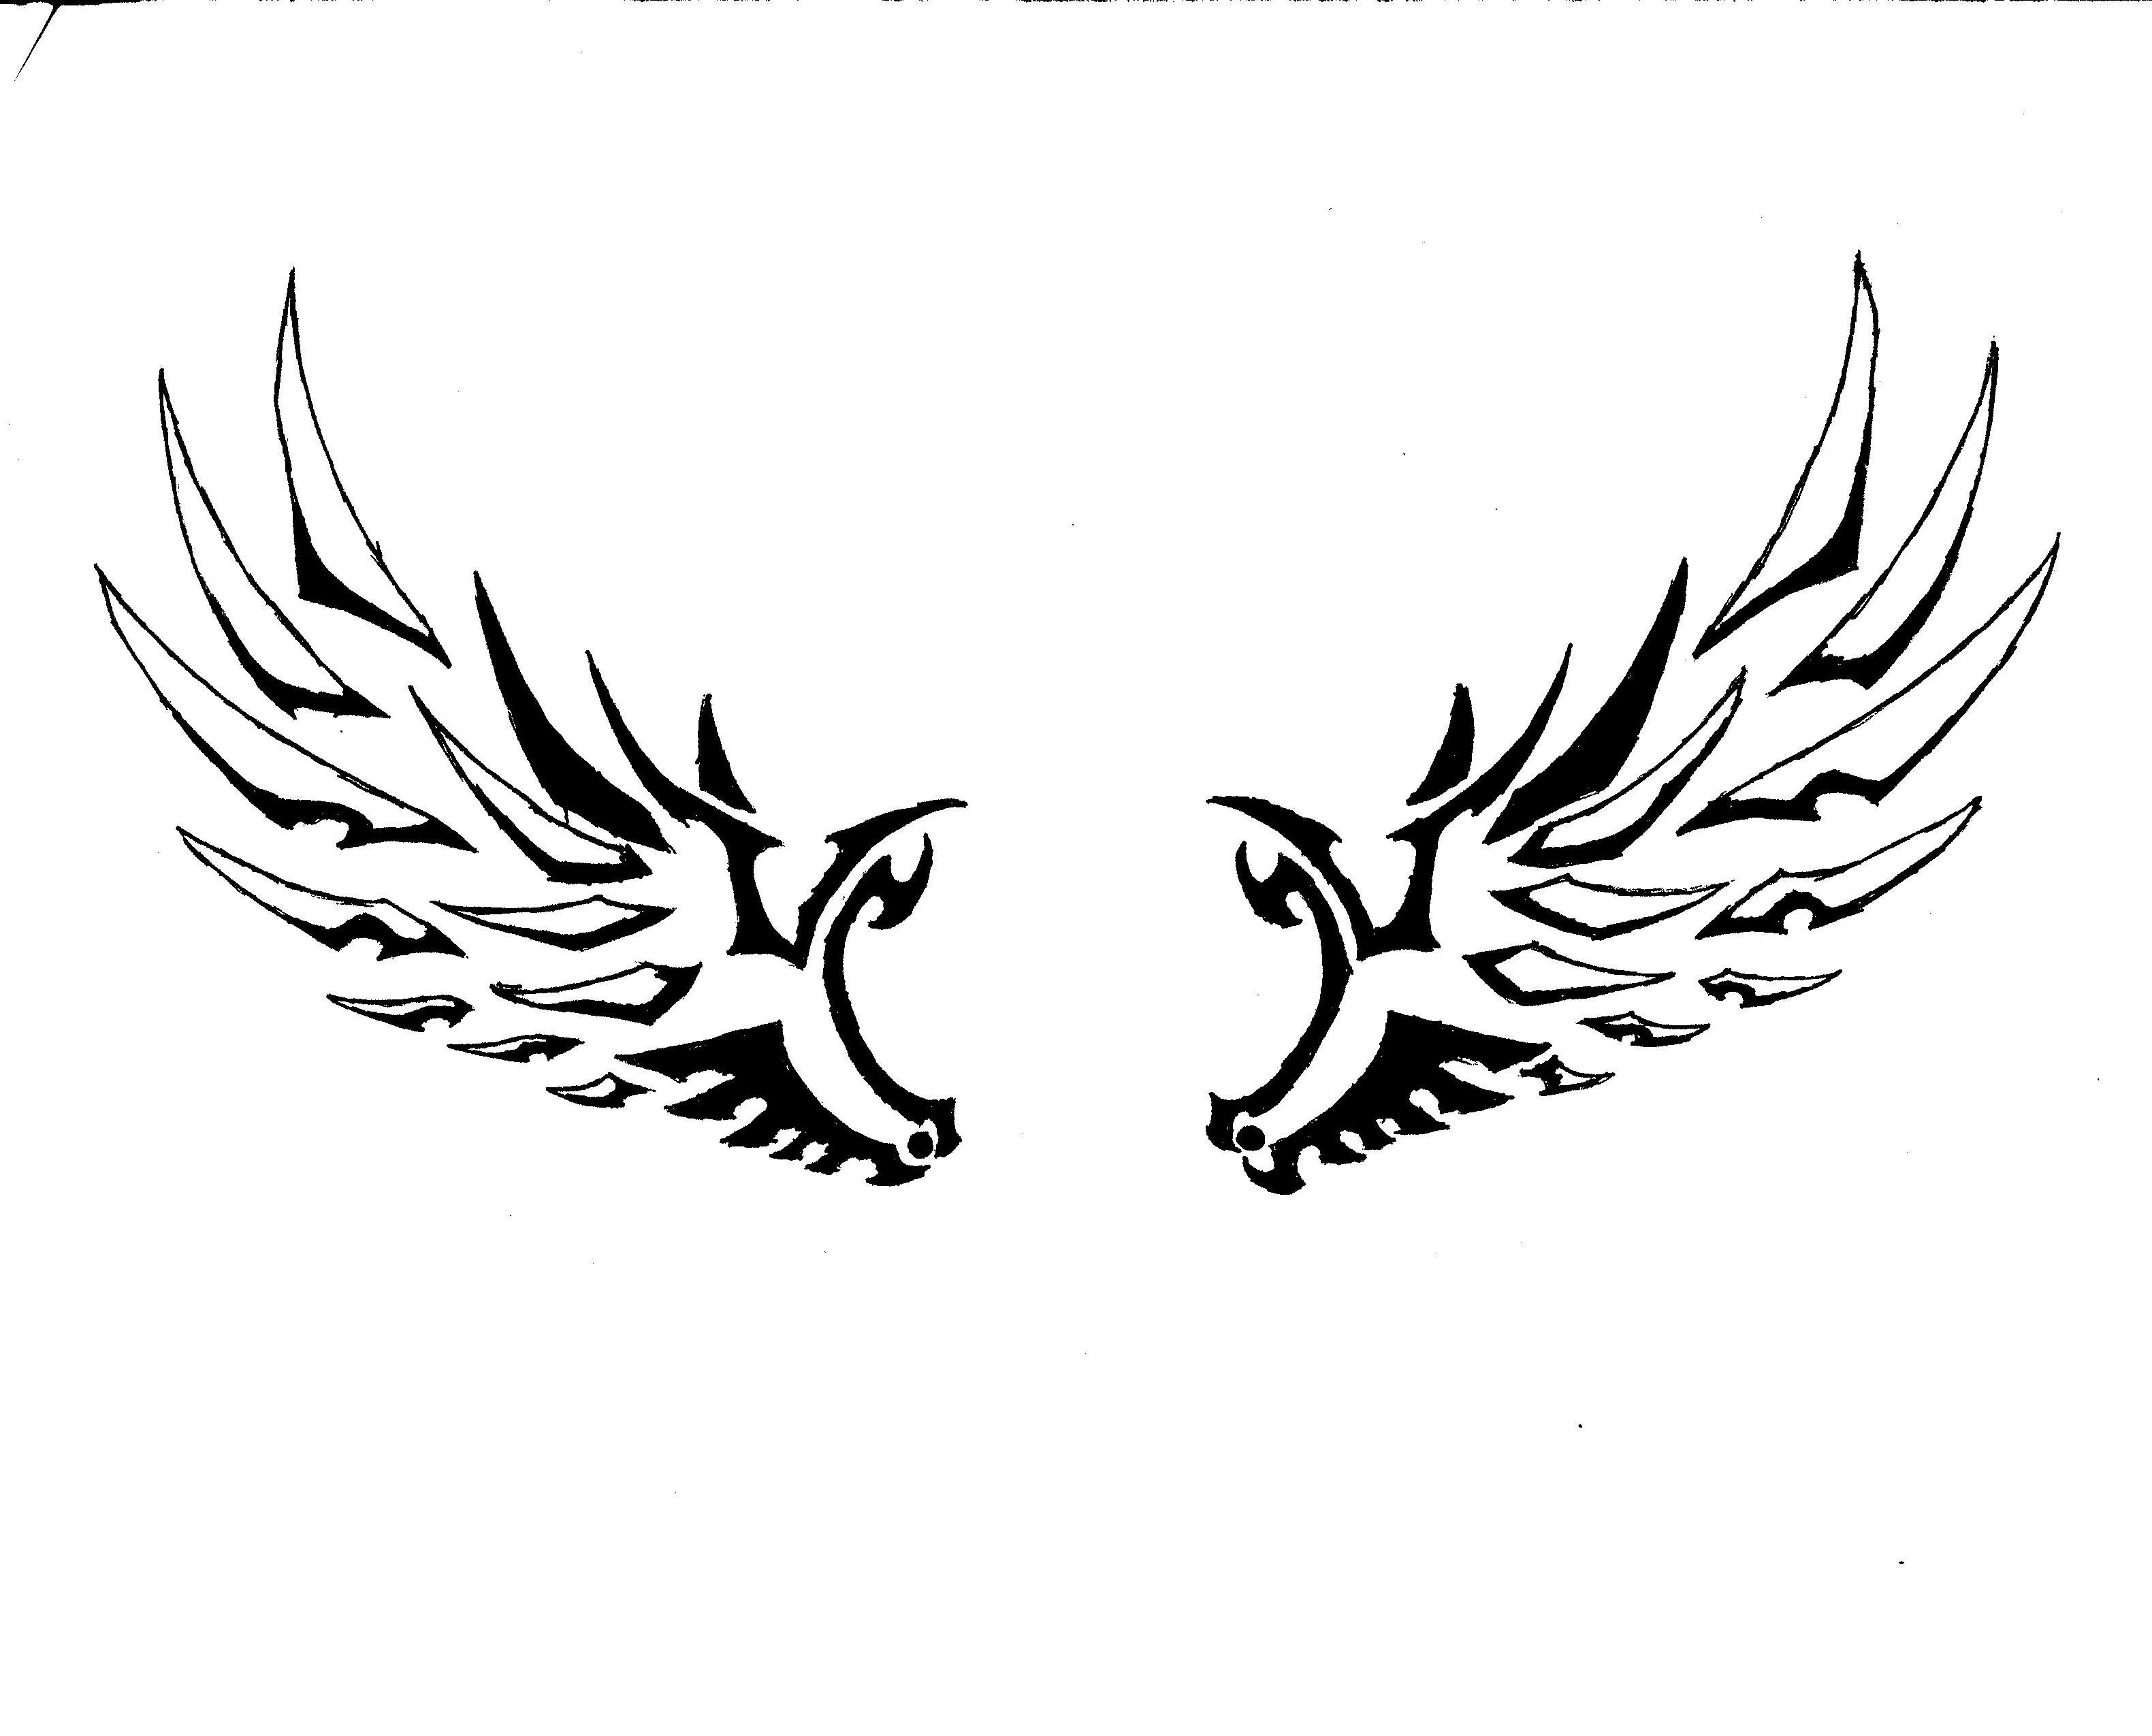 Tribal Angel Wings by DarkSeraphim02 on DeviantArt